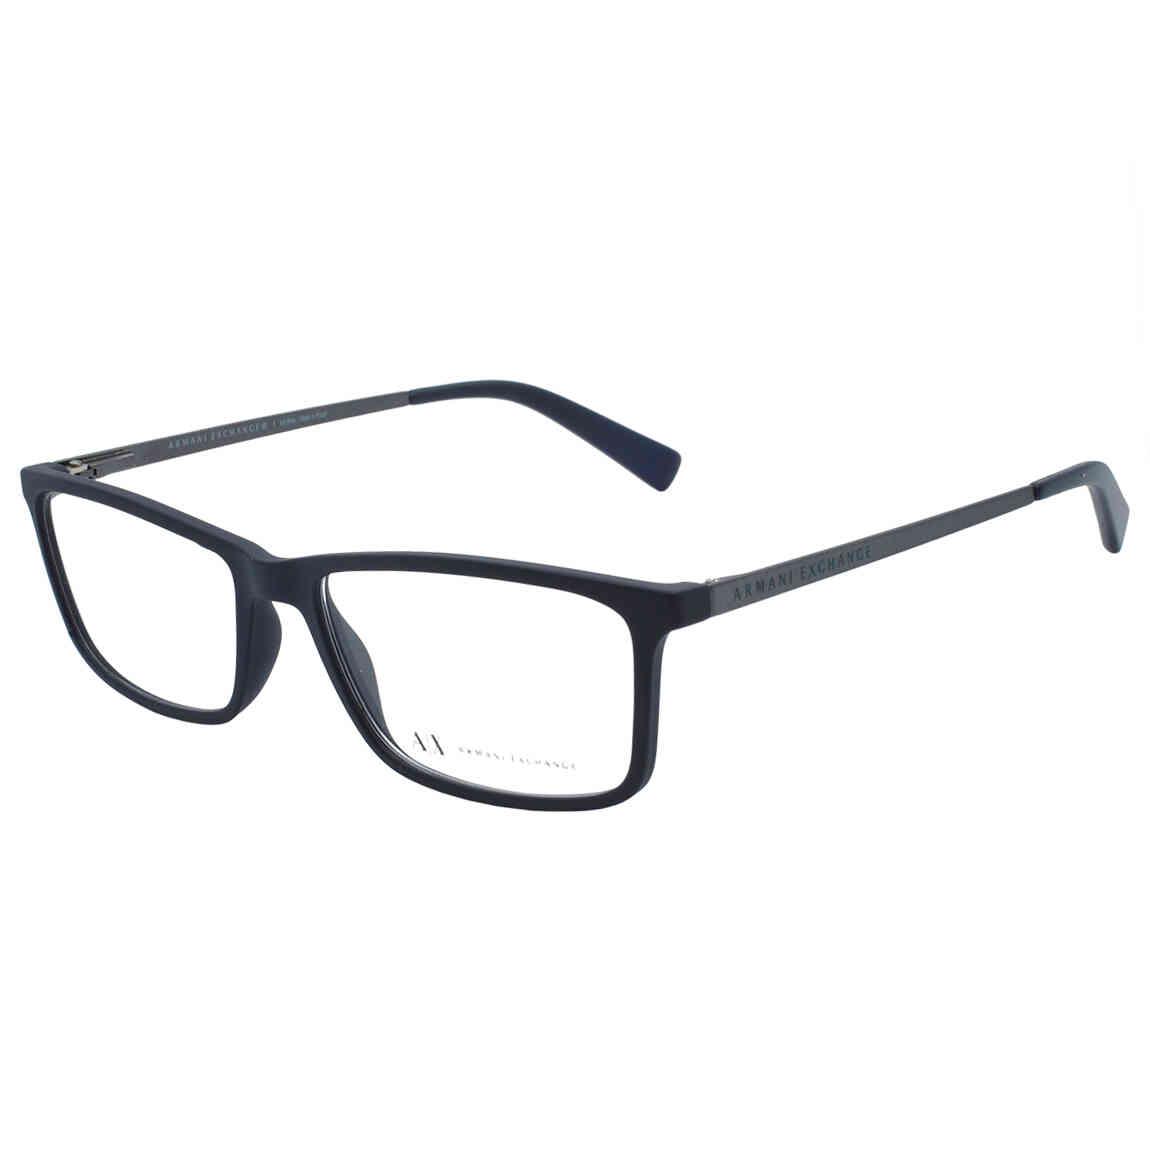 Óculos de Grau Armani Exchange Masculino AX3027L